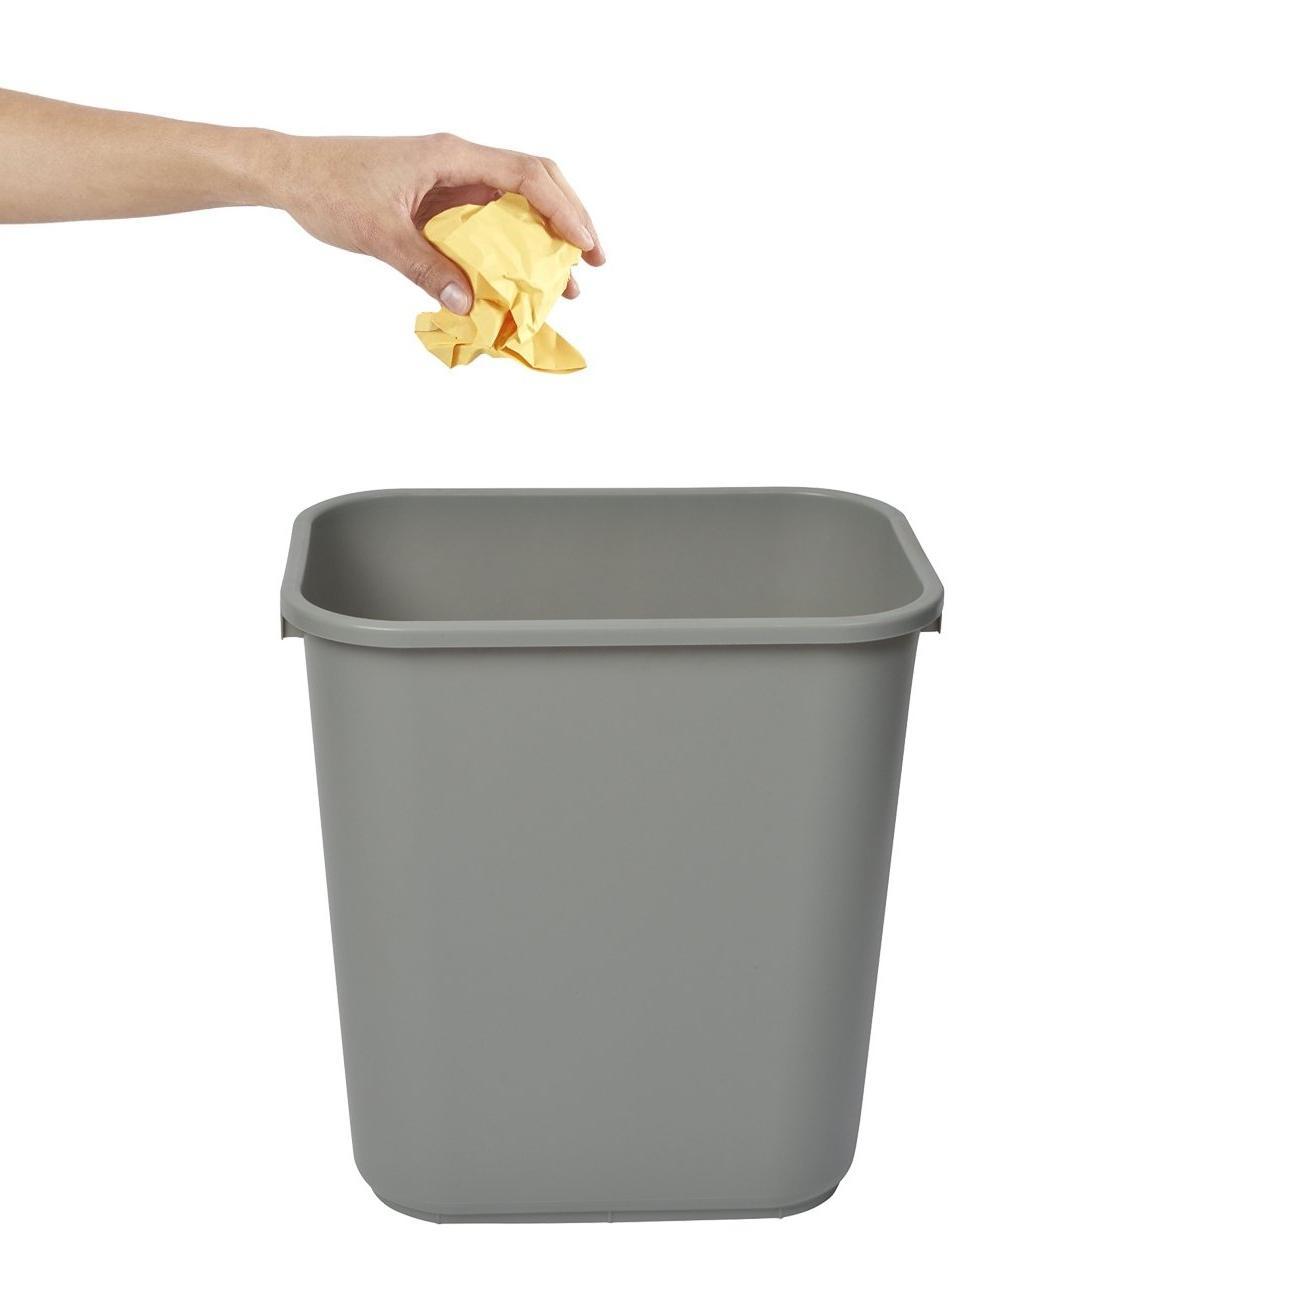 Janico 10 Waste Basket